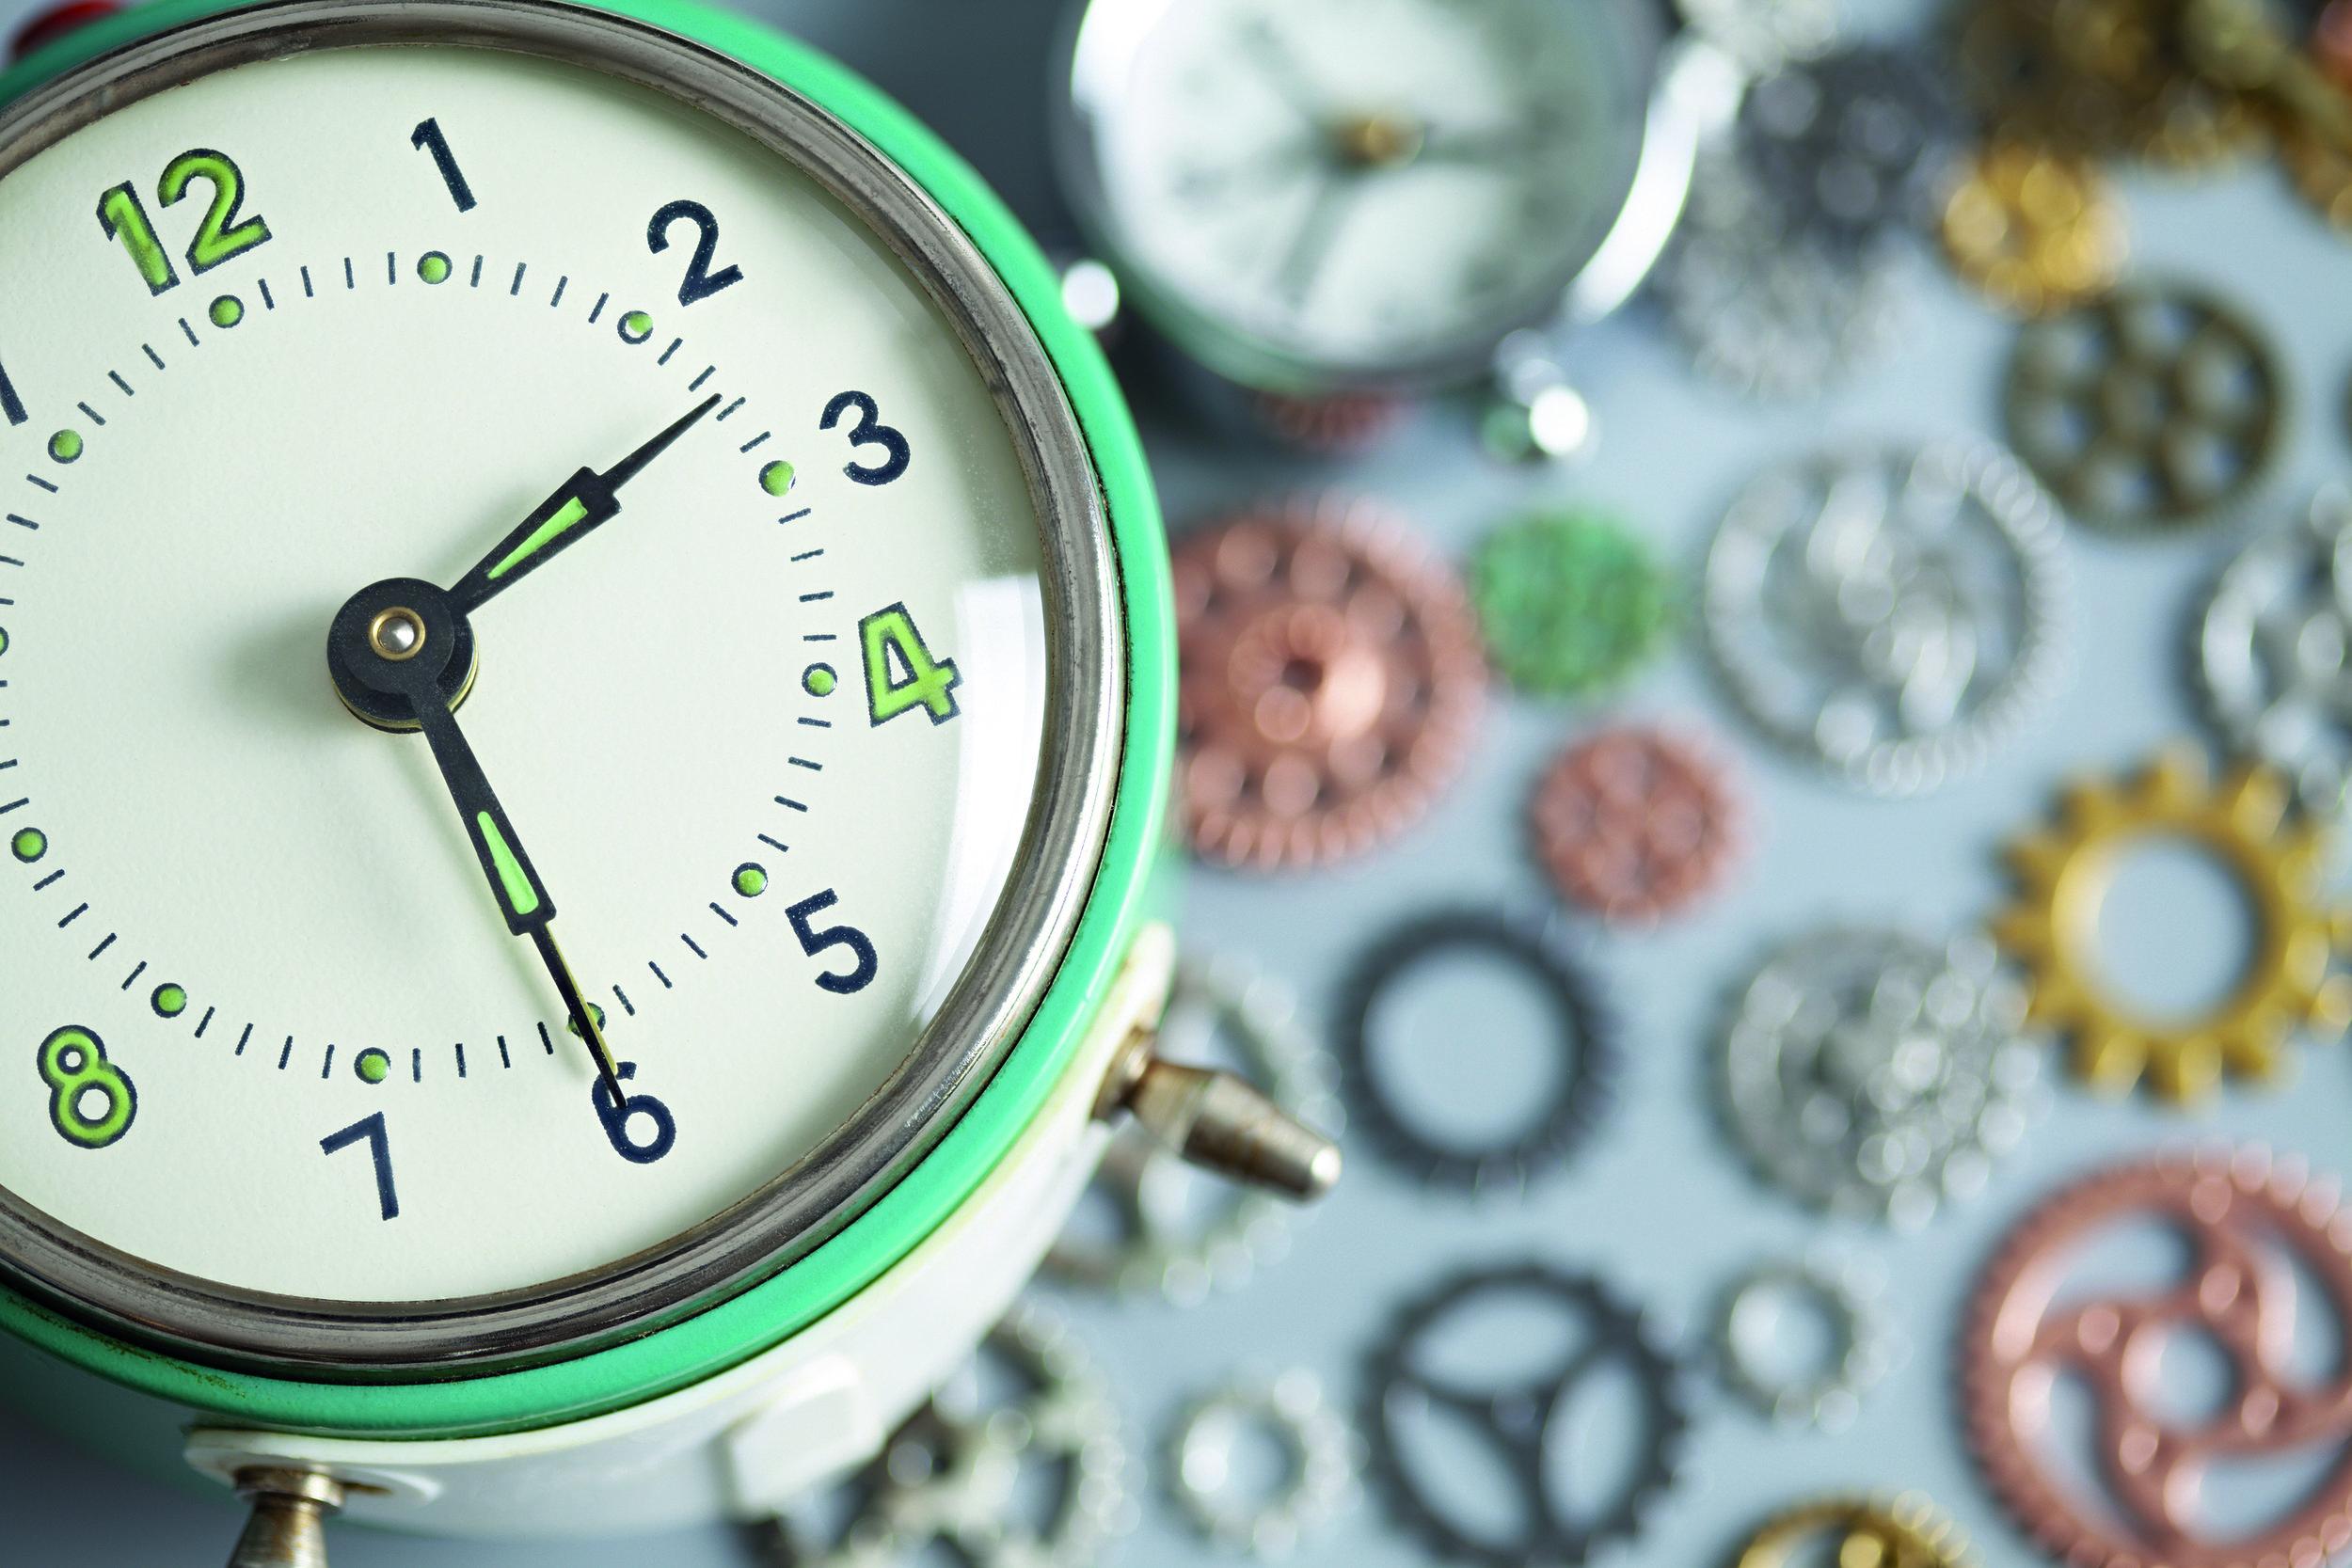 bigstock-Old-Retro-Vintage-Alarm-Clock--302021788.jpg